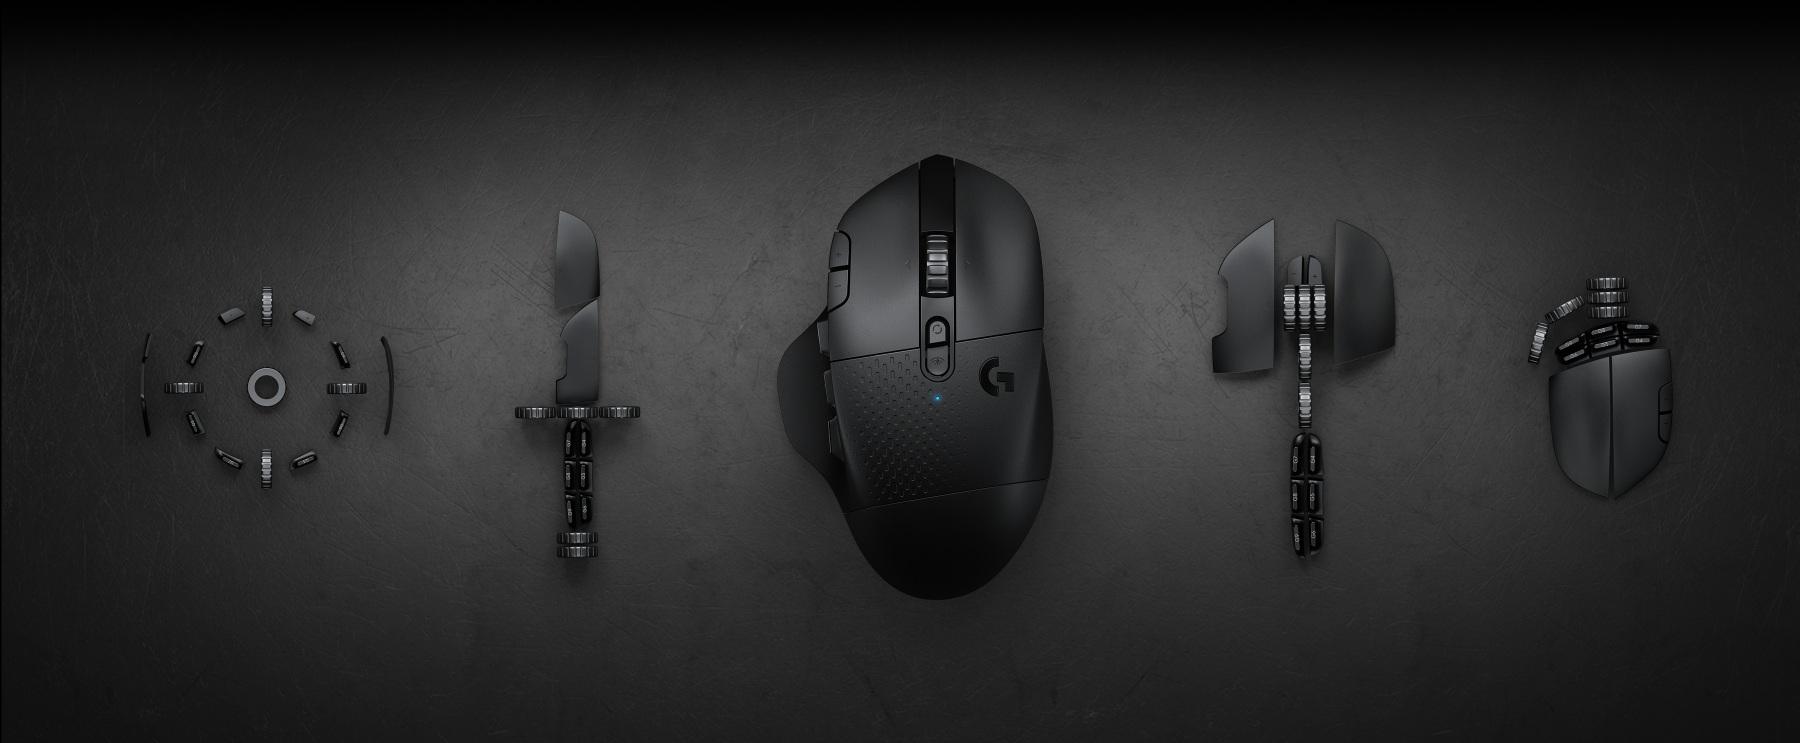 Giới thiệu Chuột chơi game Logitech G604 Lightspeed Wireless HERO Gaming Black